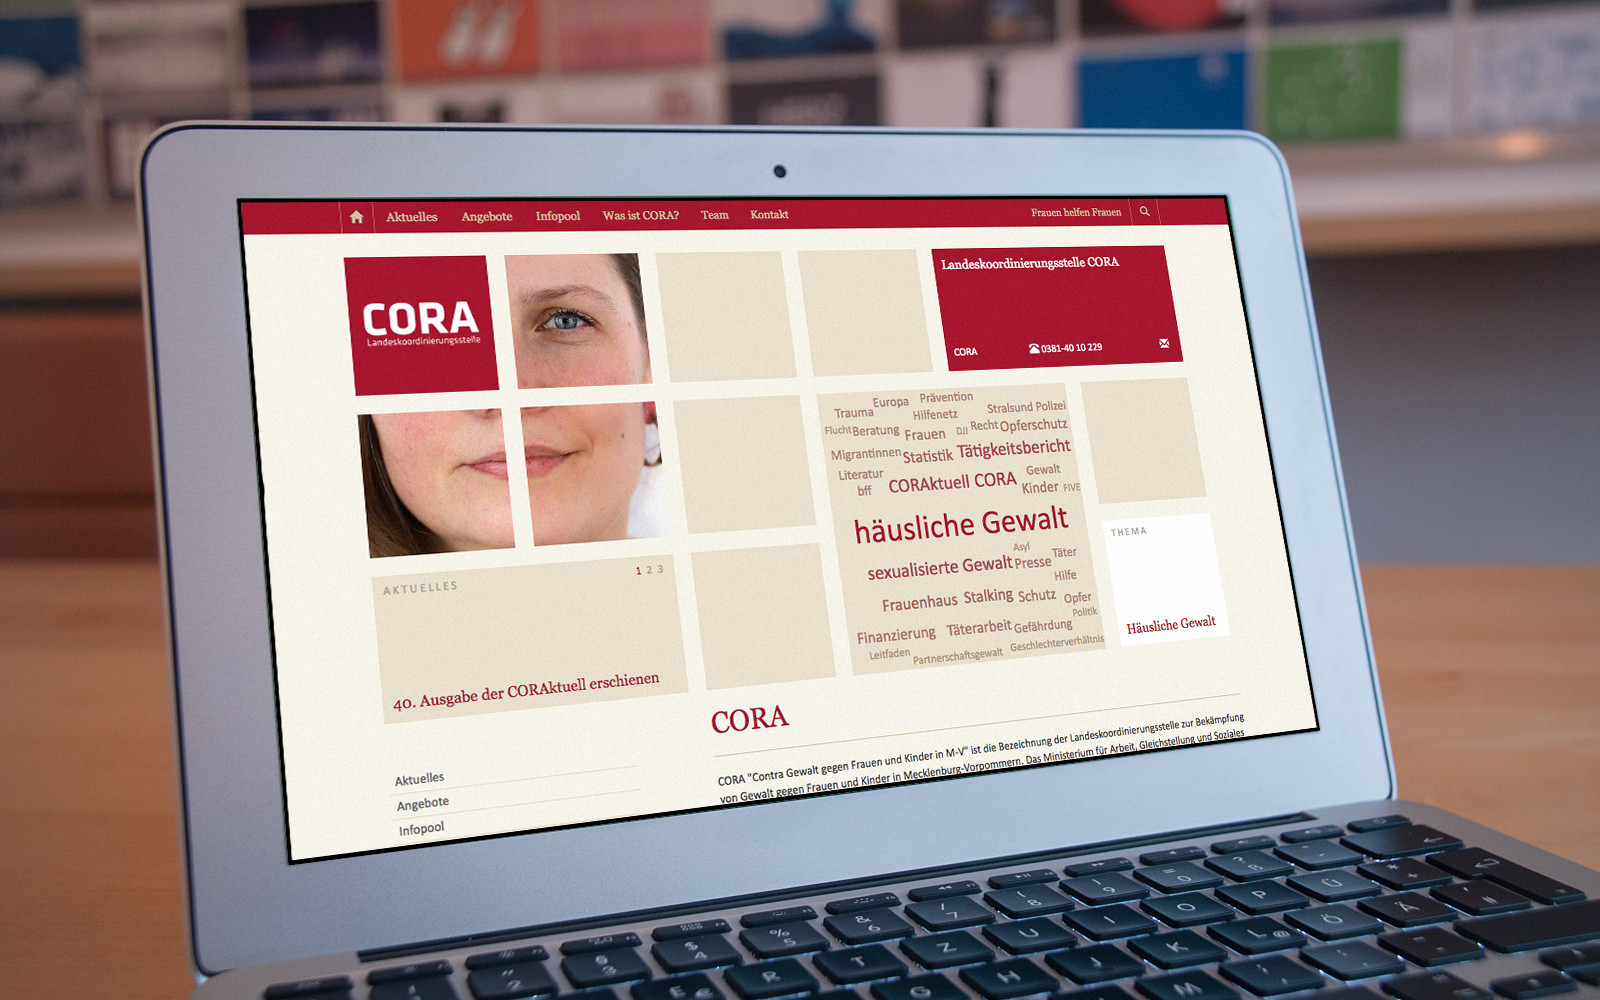 FHF_Website_CORA_MacBook